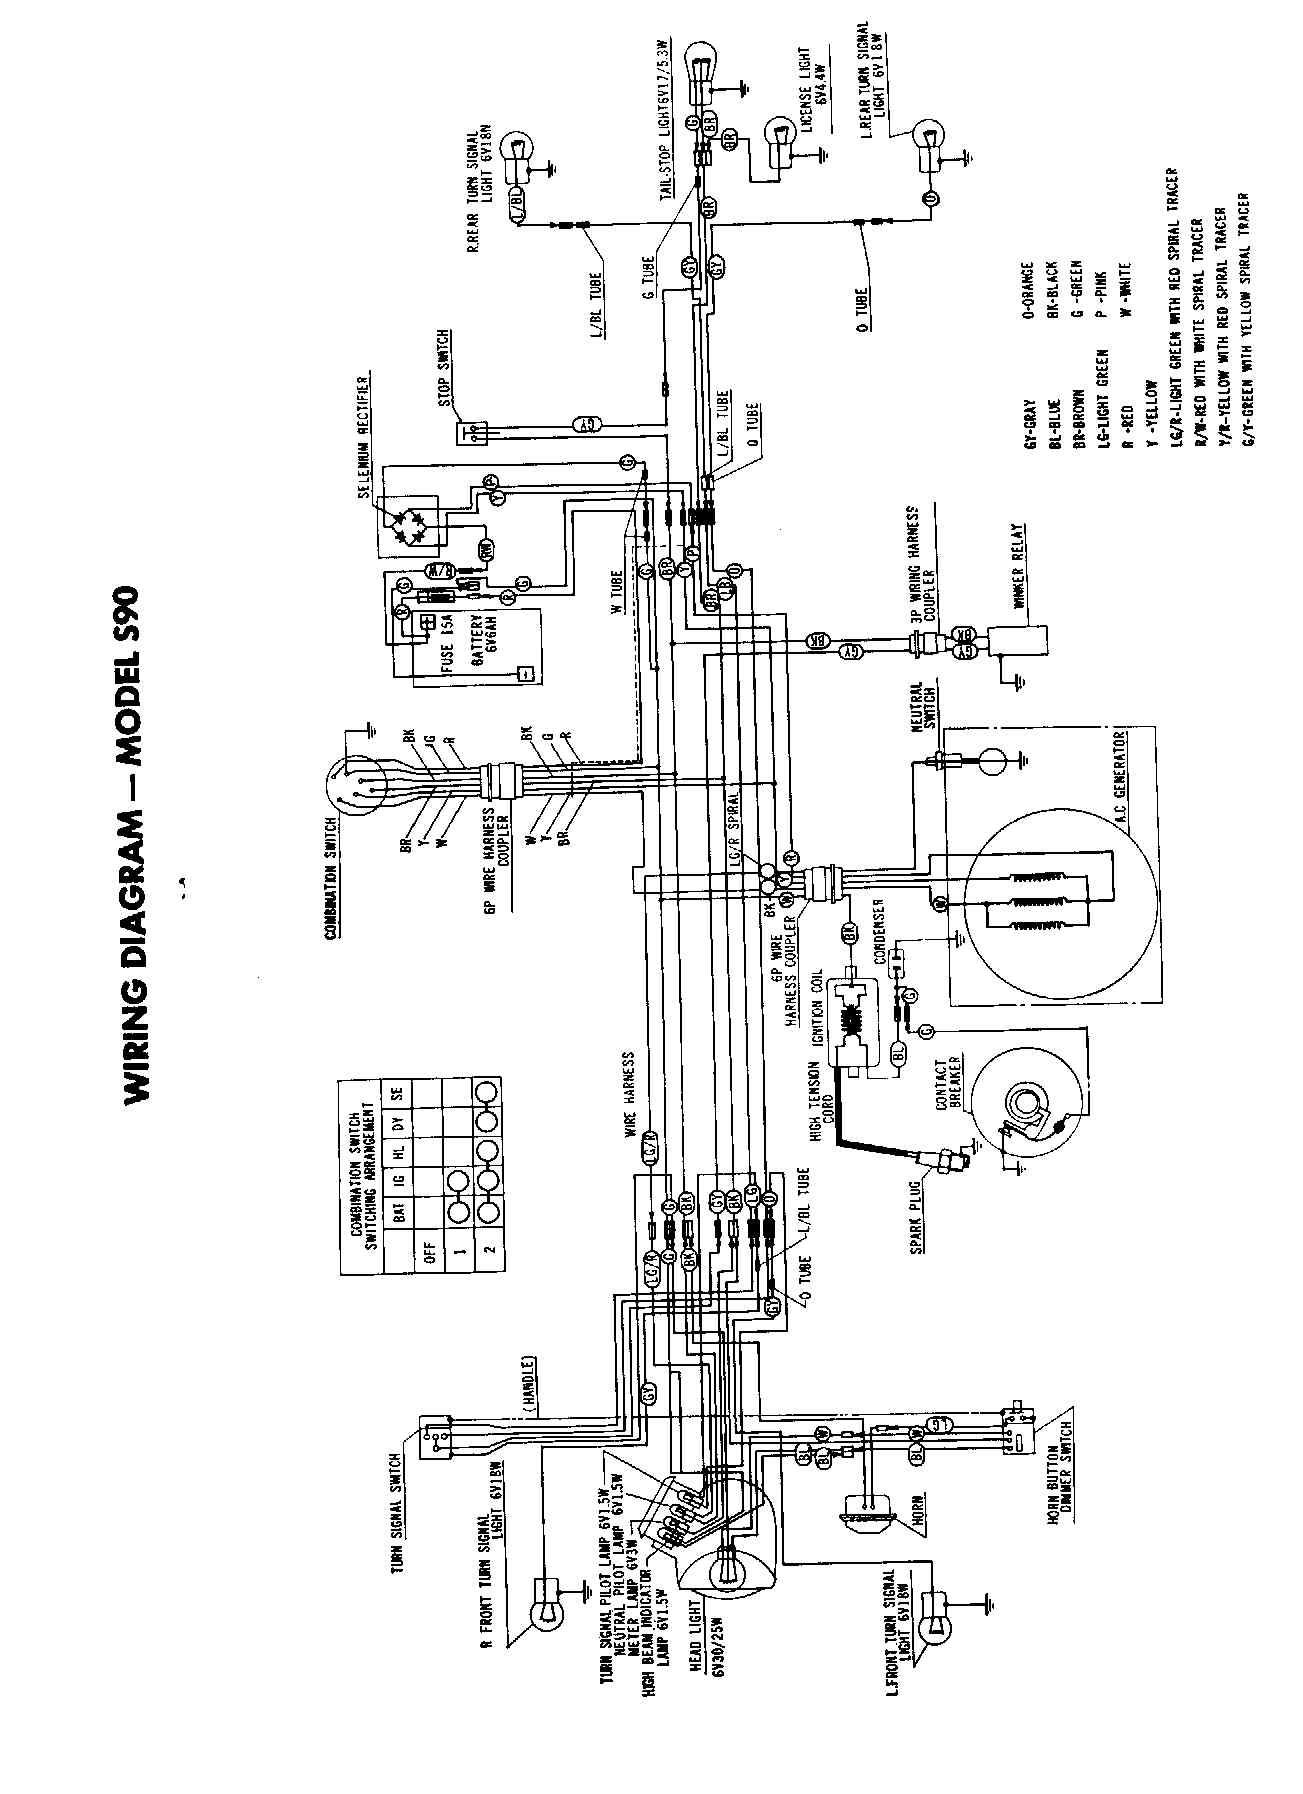 Wiring Diagram For Honda Xr200